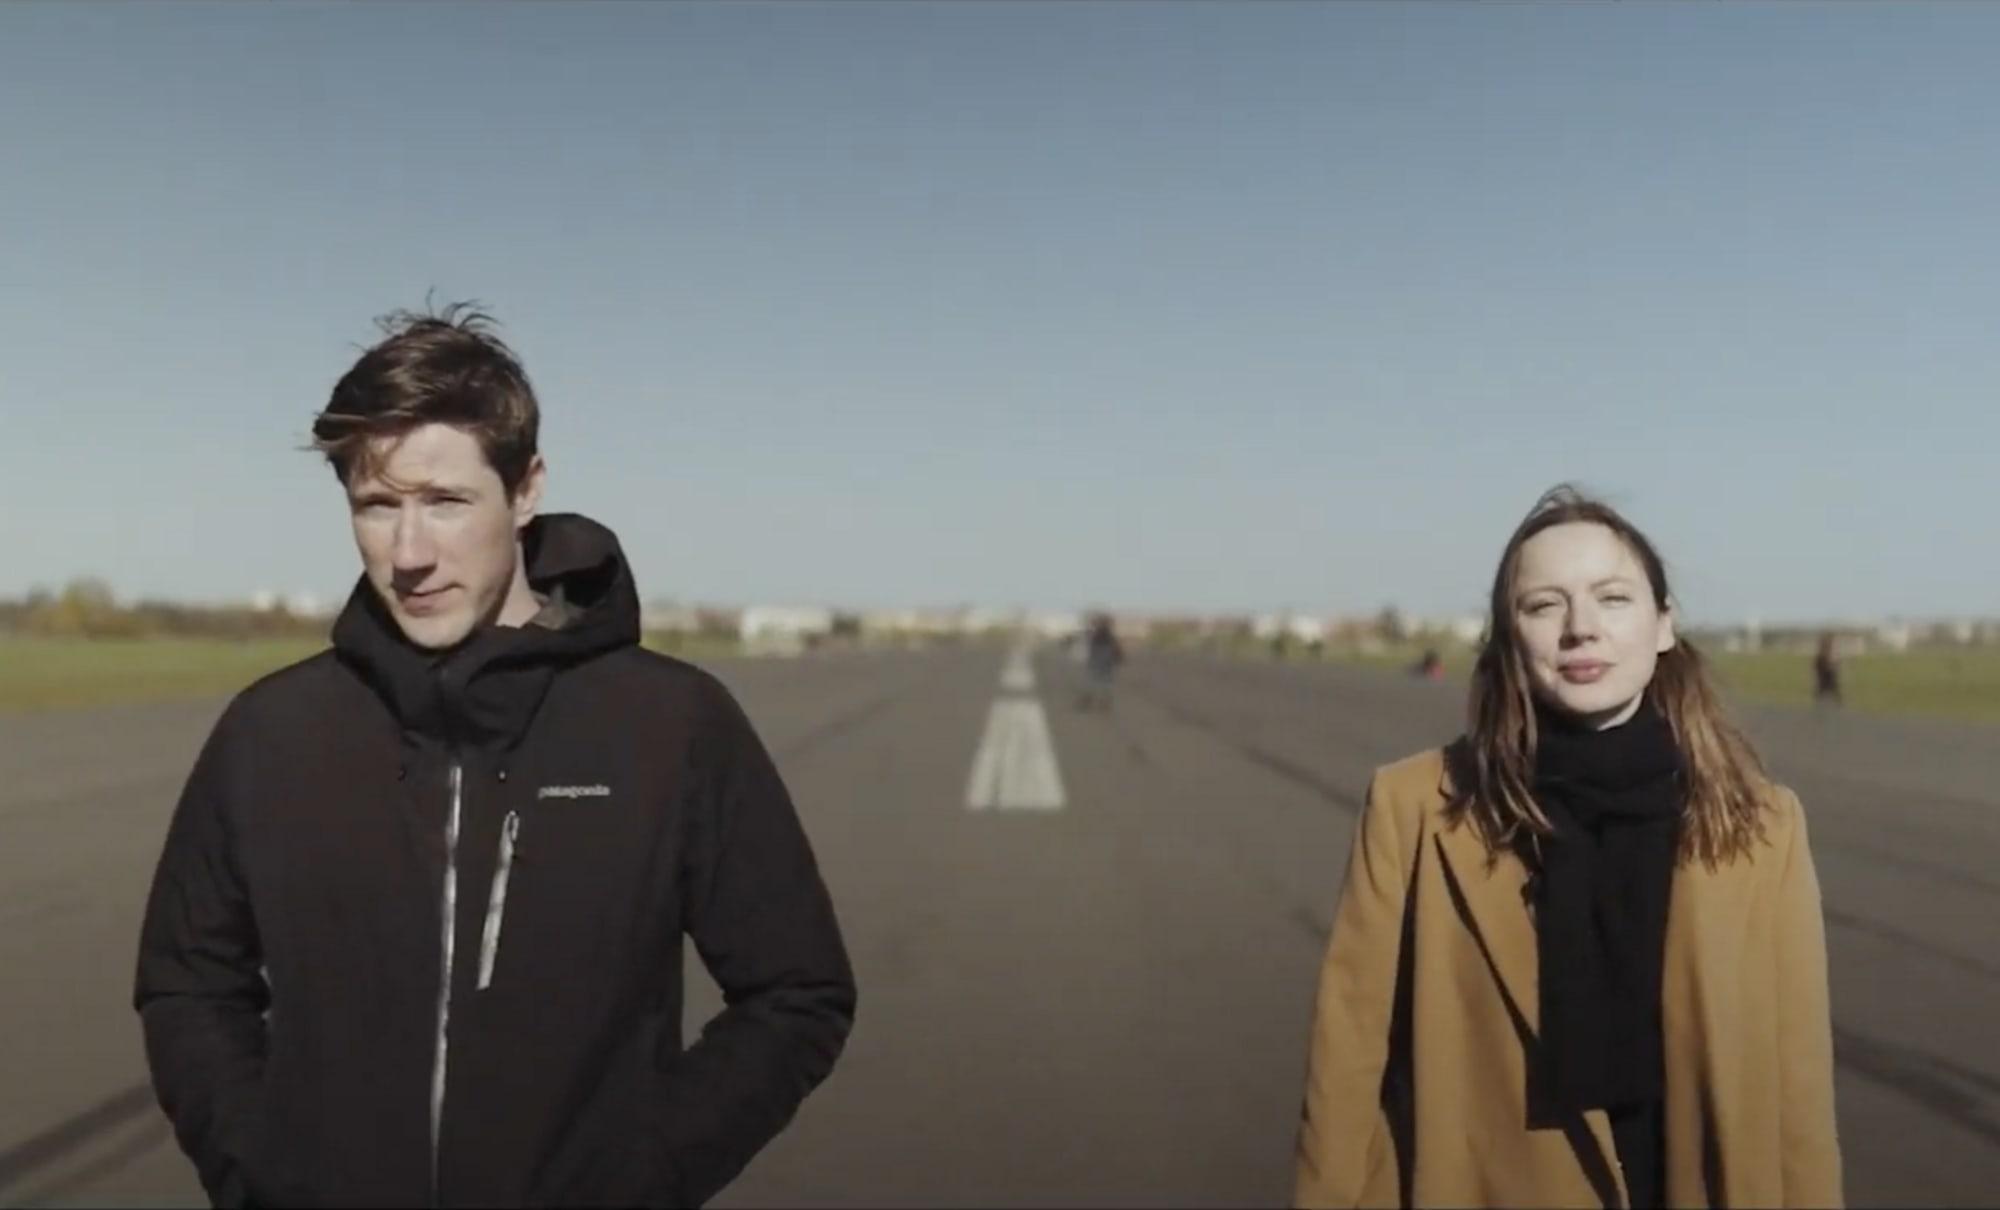 Take a walk with Sam Vance-Law